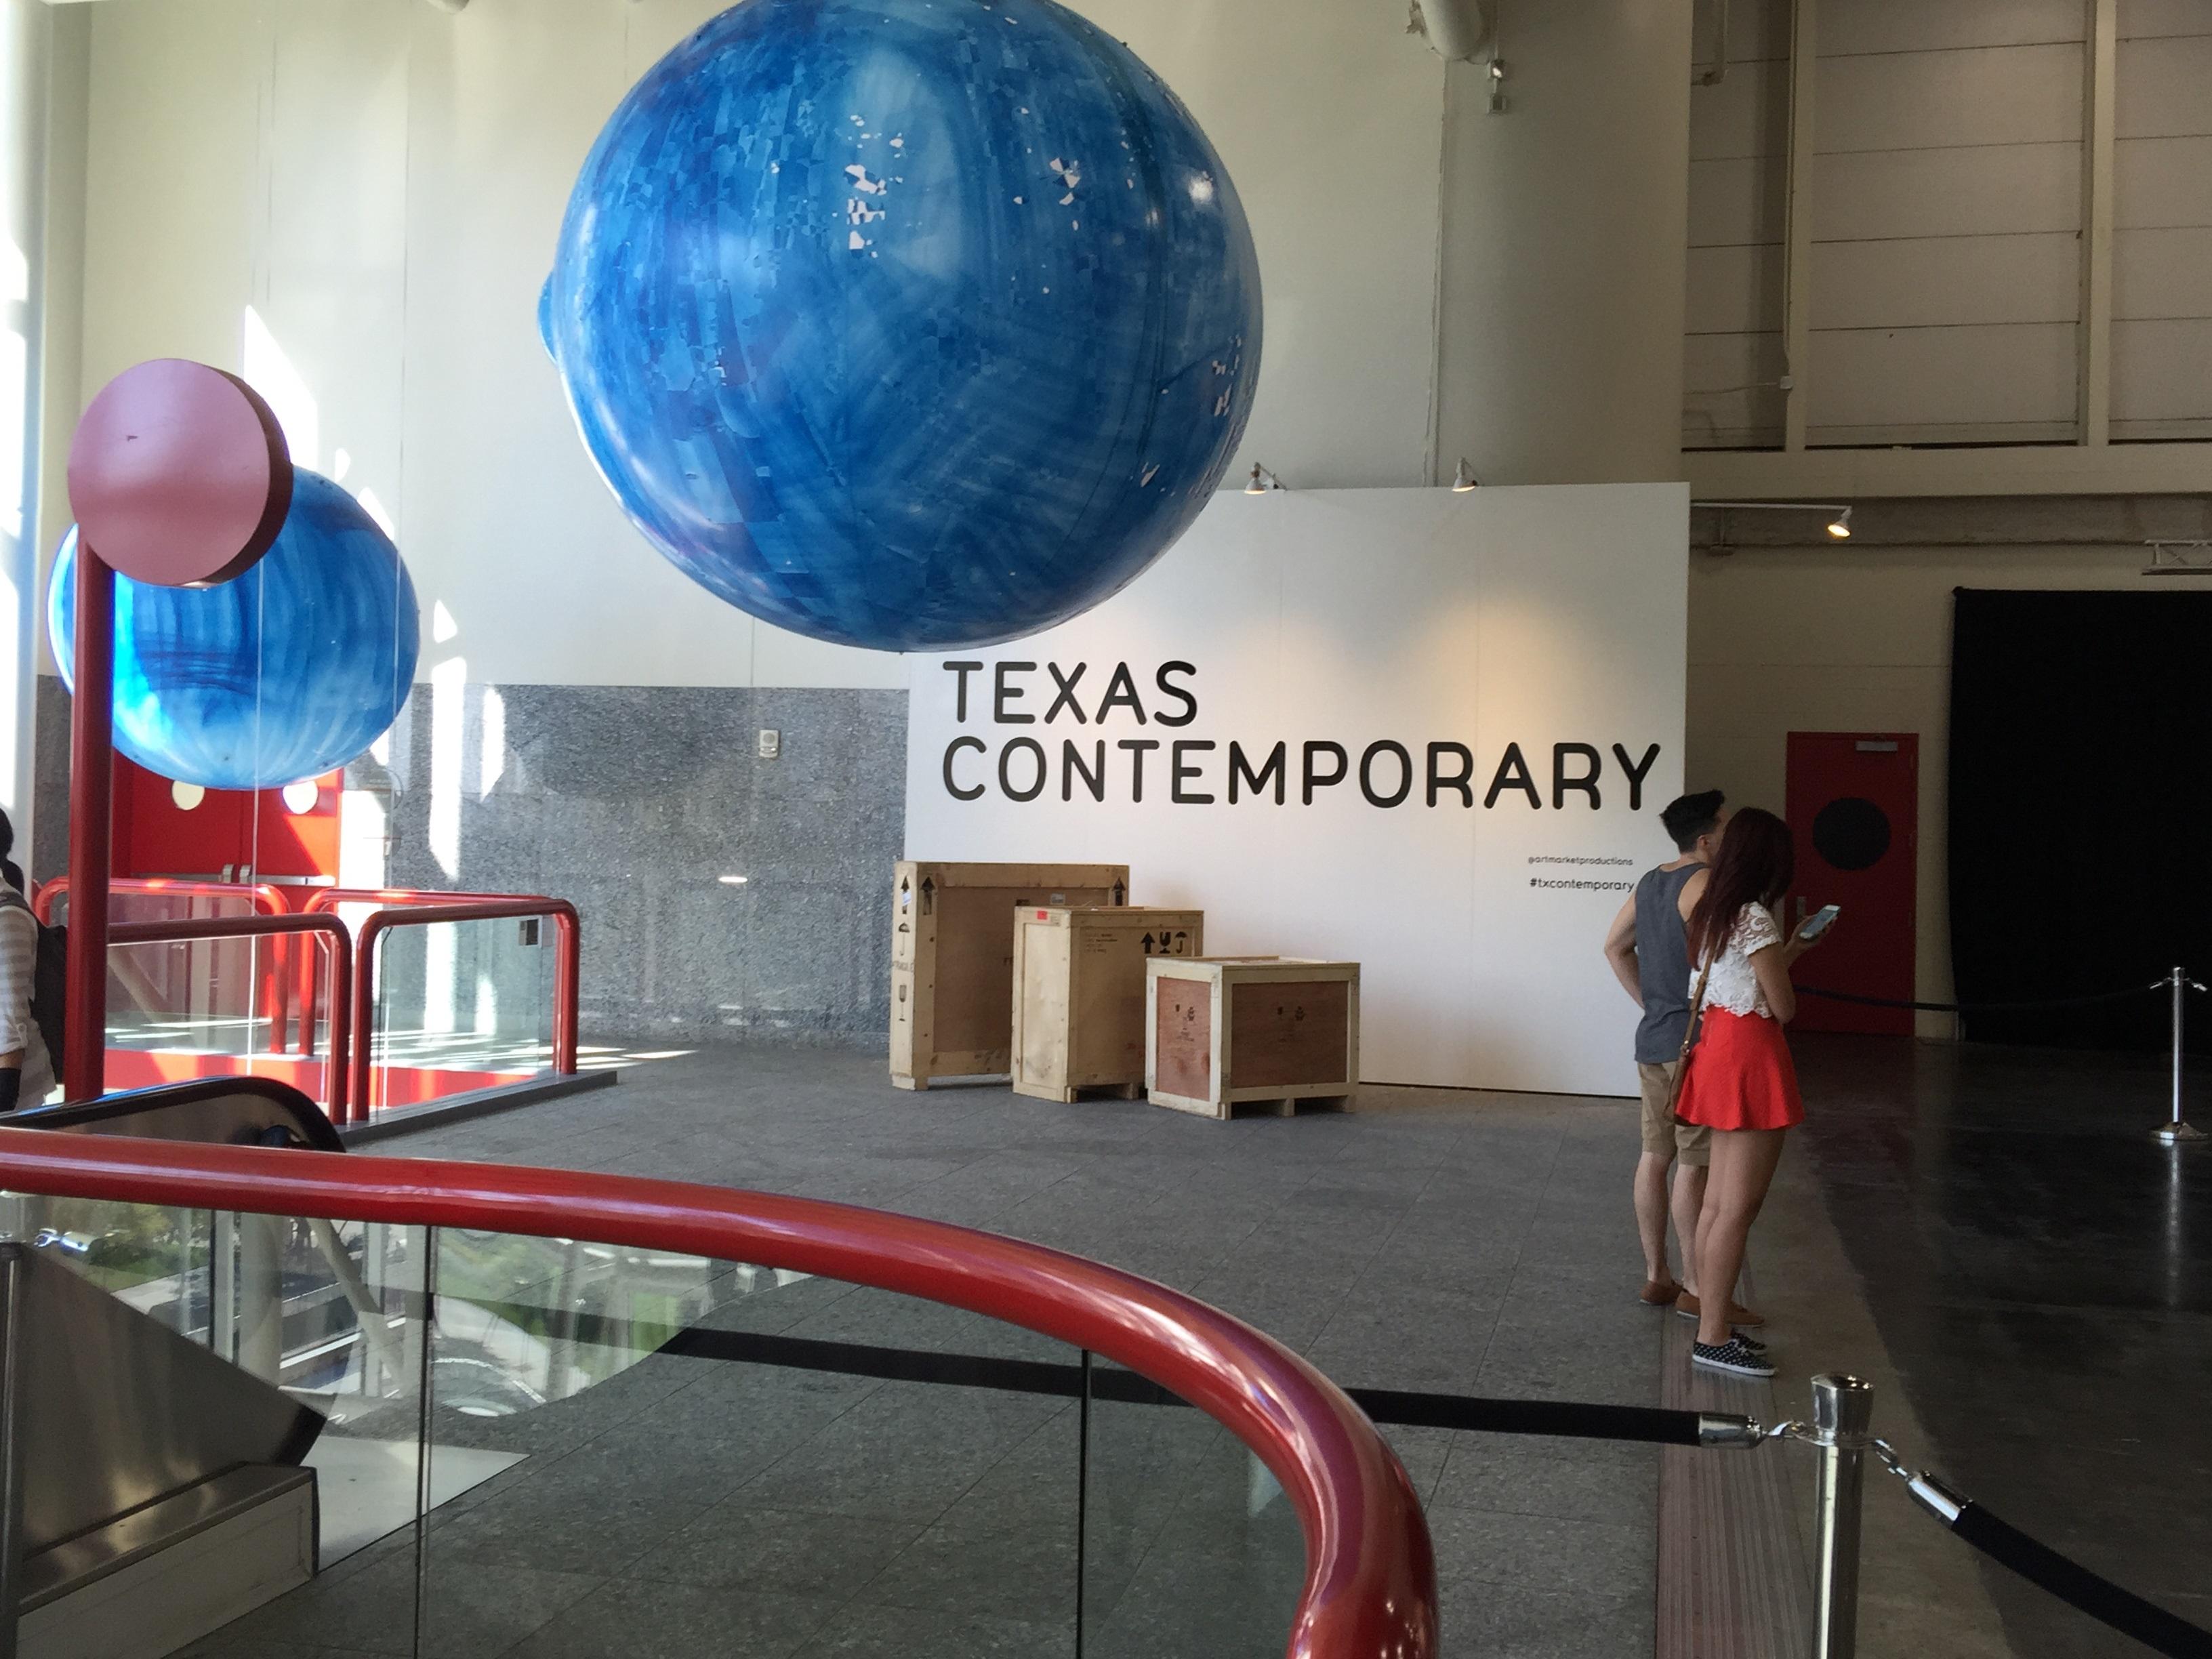 Texas Contemporary Art Fair   Adelson Galleries, New York, Boston  bullet shell art, avant-garde, art, fine art, artist, gallery, art gallery, exhibit, Impressionism, Realism, Modernism